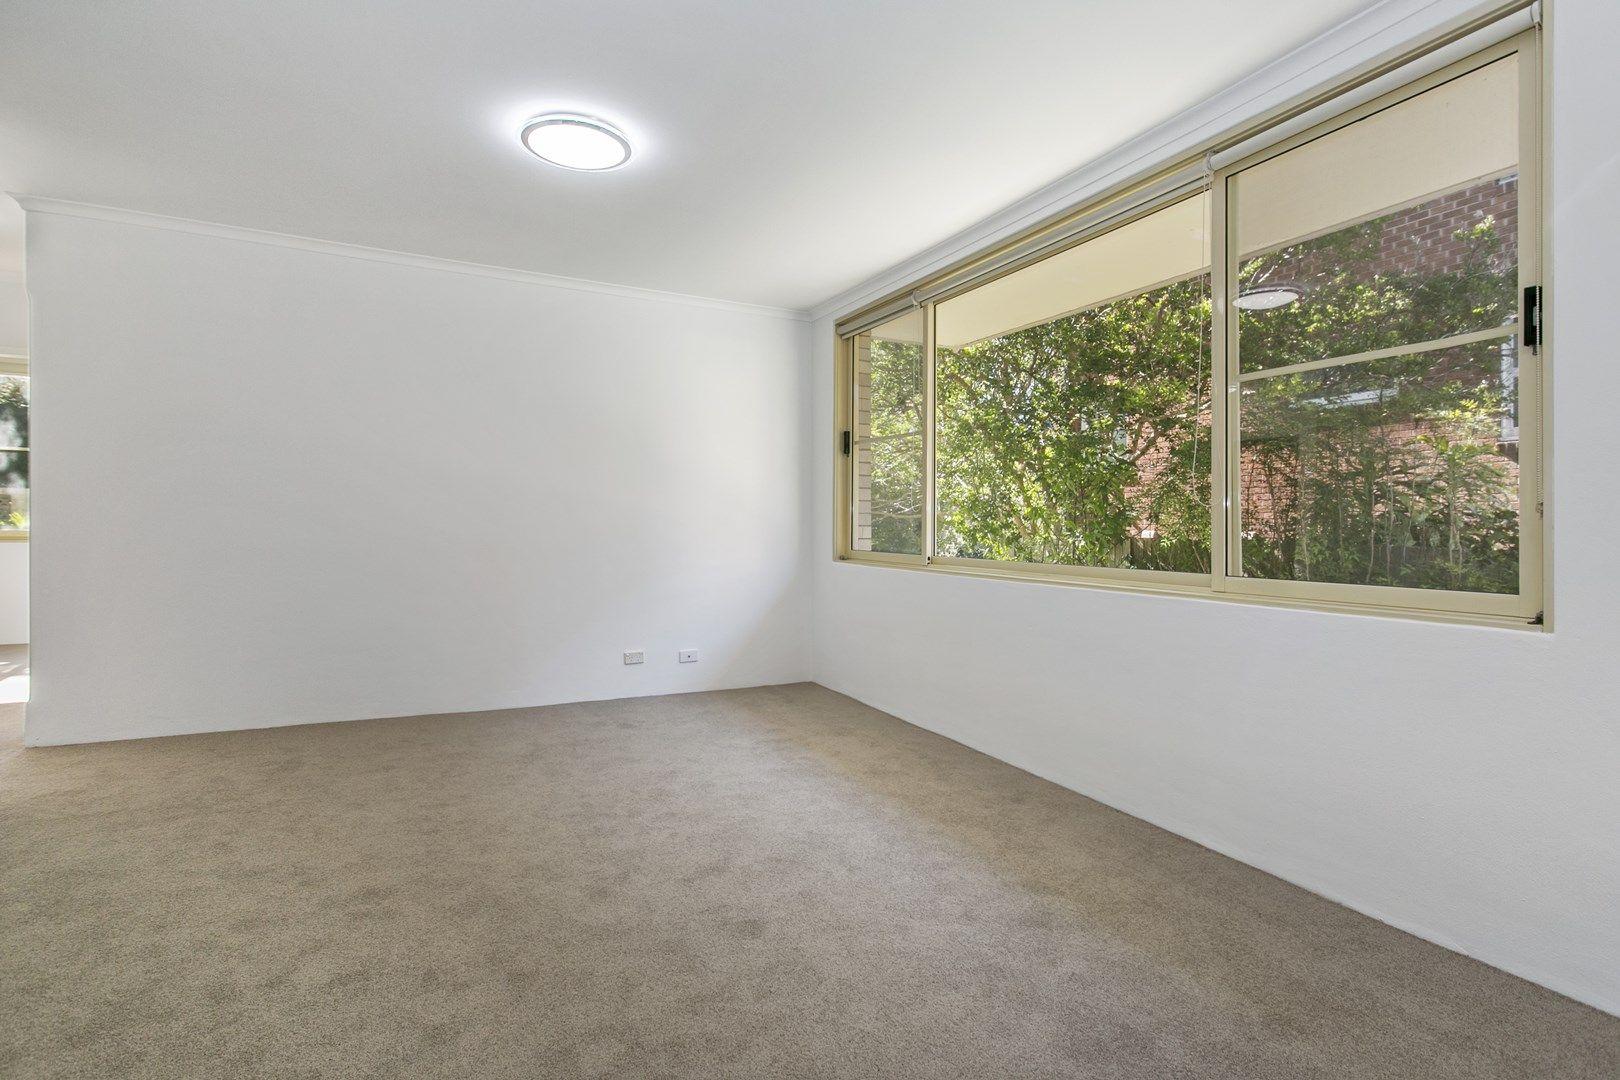 1/15 Orchard Street, Balgowlah NSW 2093, Image 0